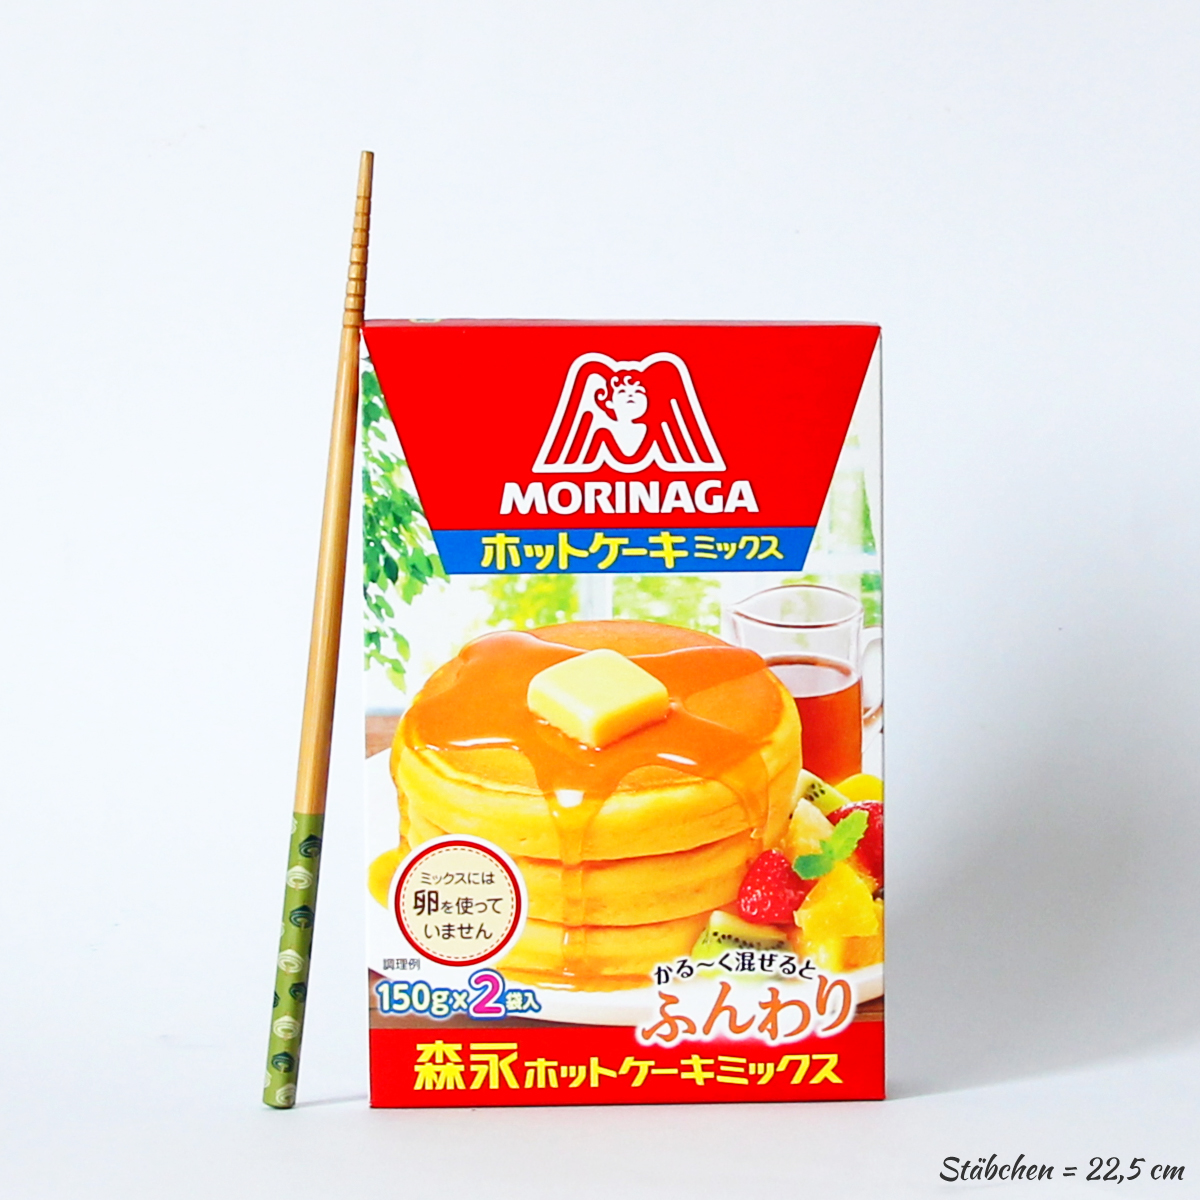 Hot Cake Mix 300g (Mehlmischung für Dorayaki), MORINAGA